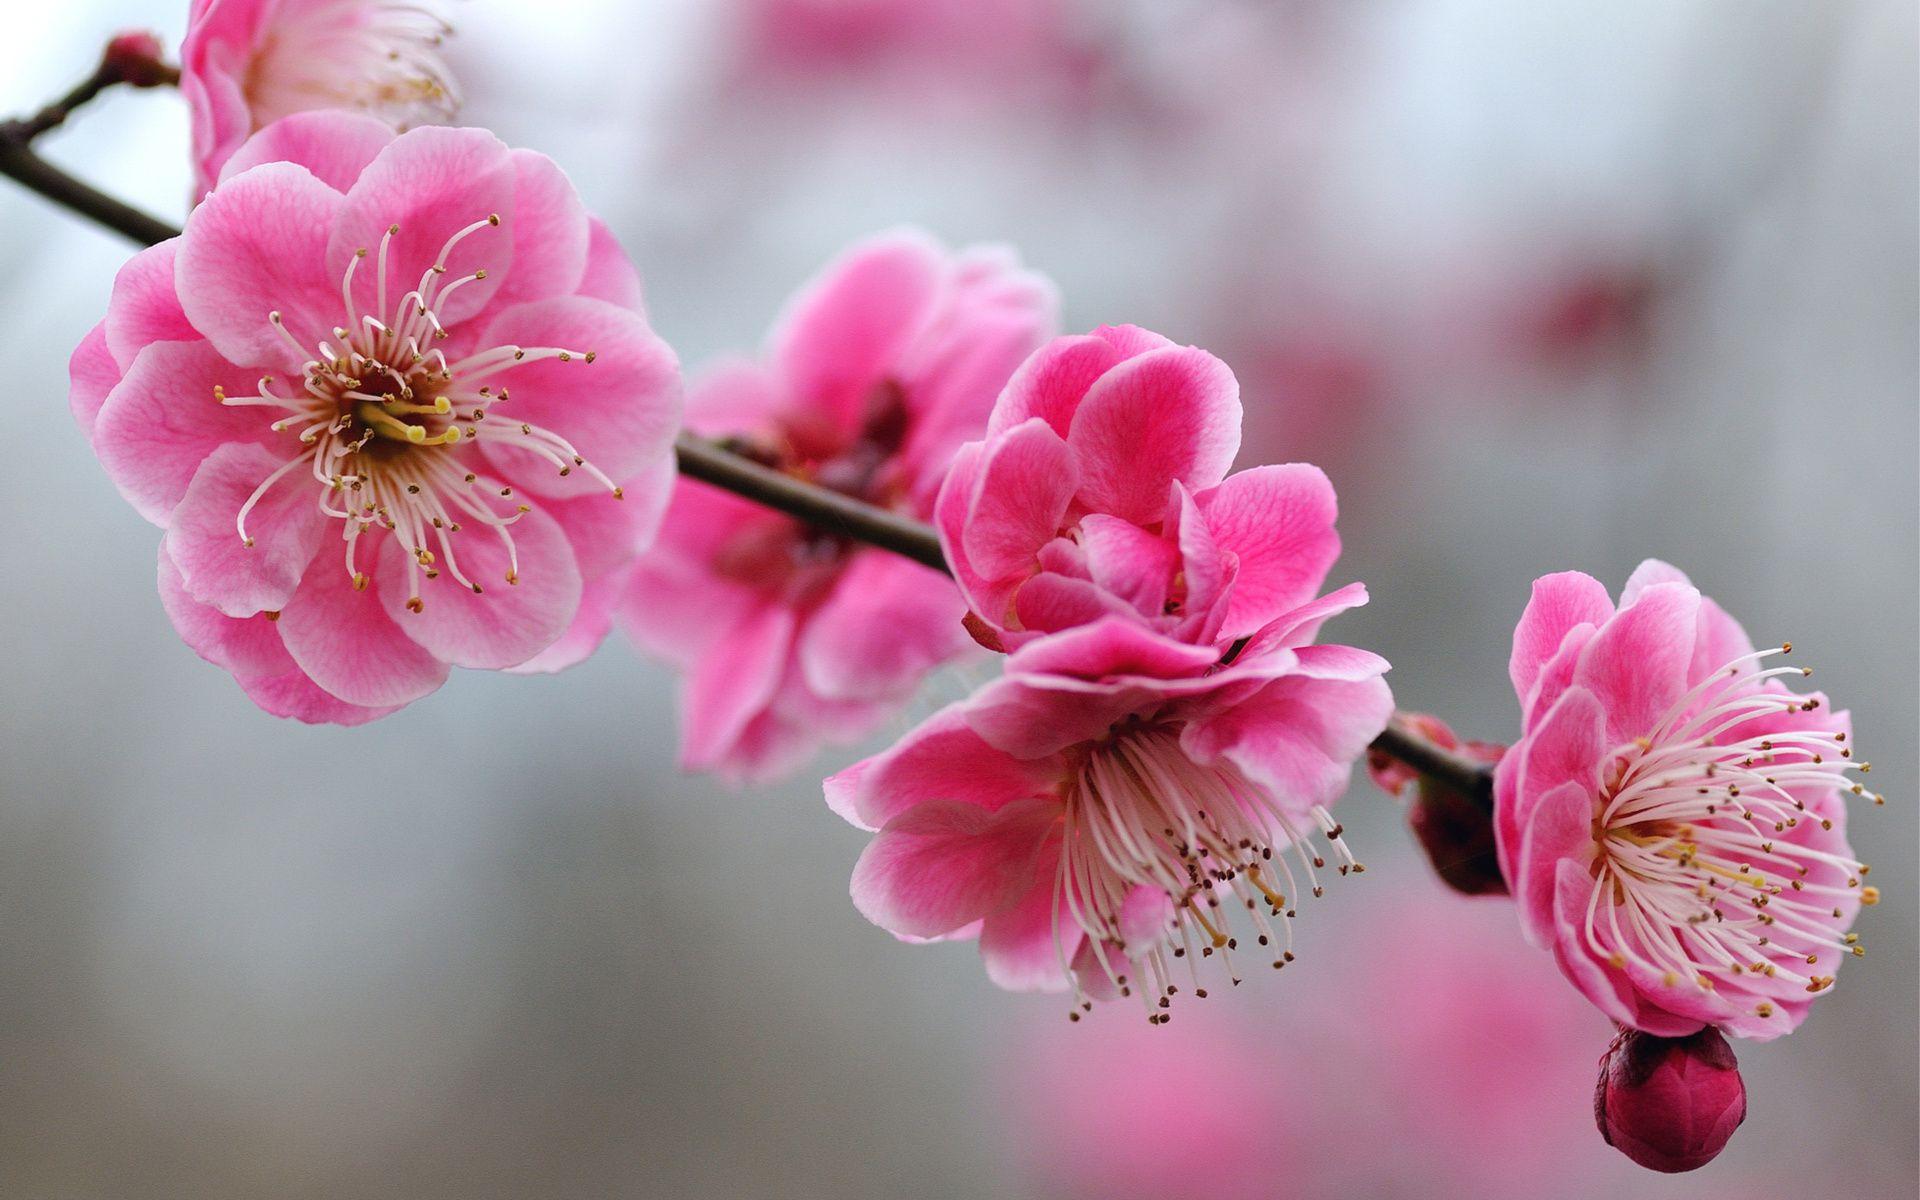 Pink Flowers Branch Jpg 960 600 Pixels